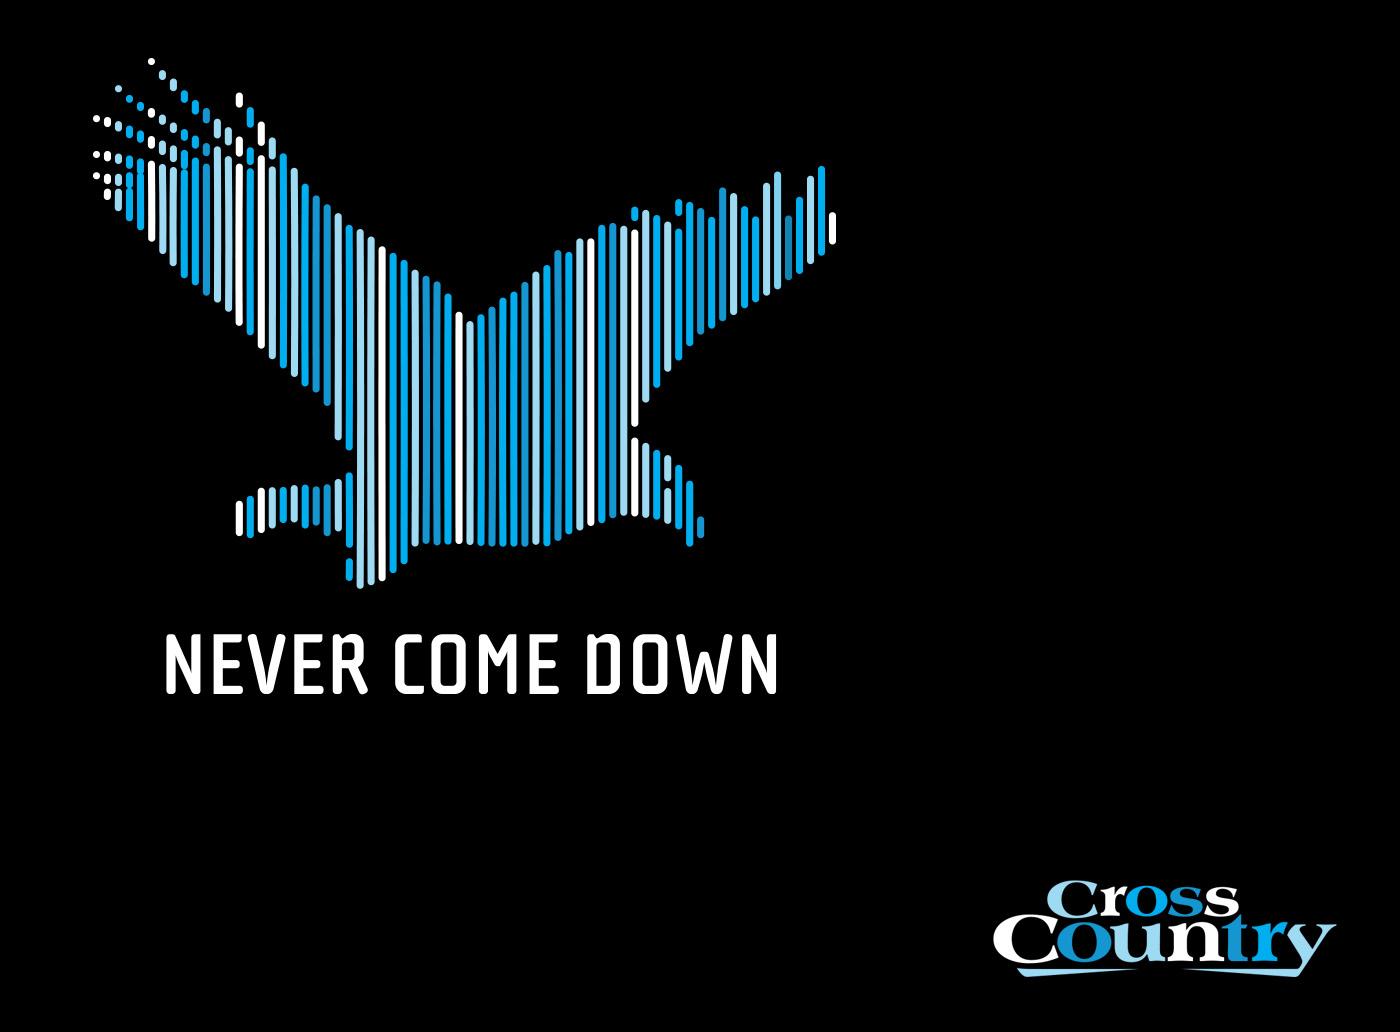 NeverComeDown.jpg